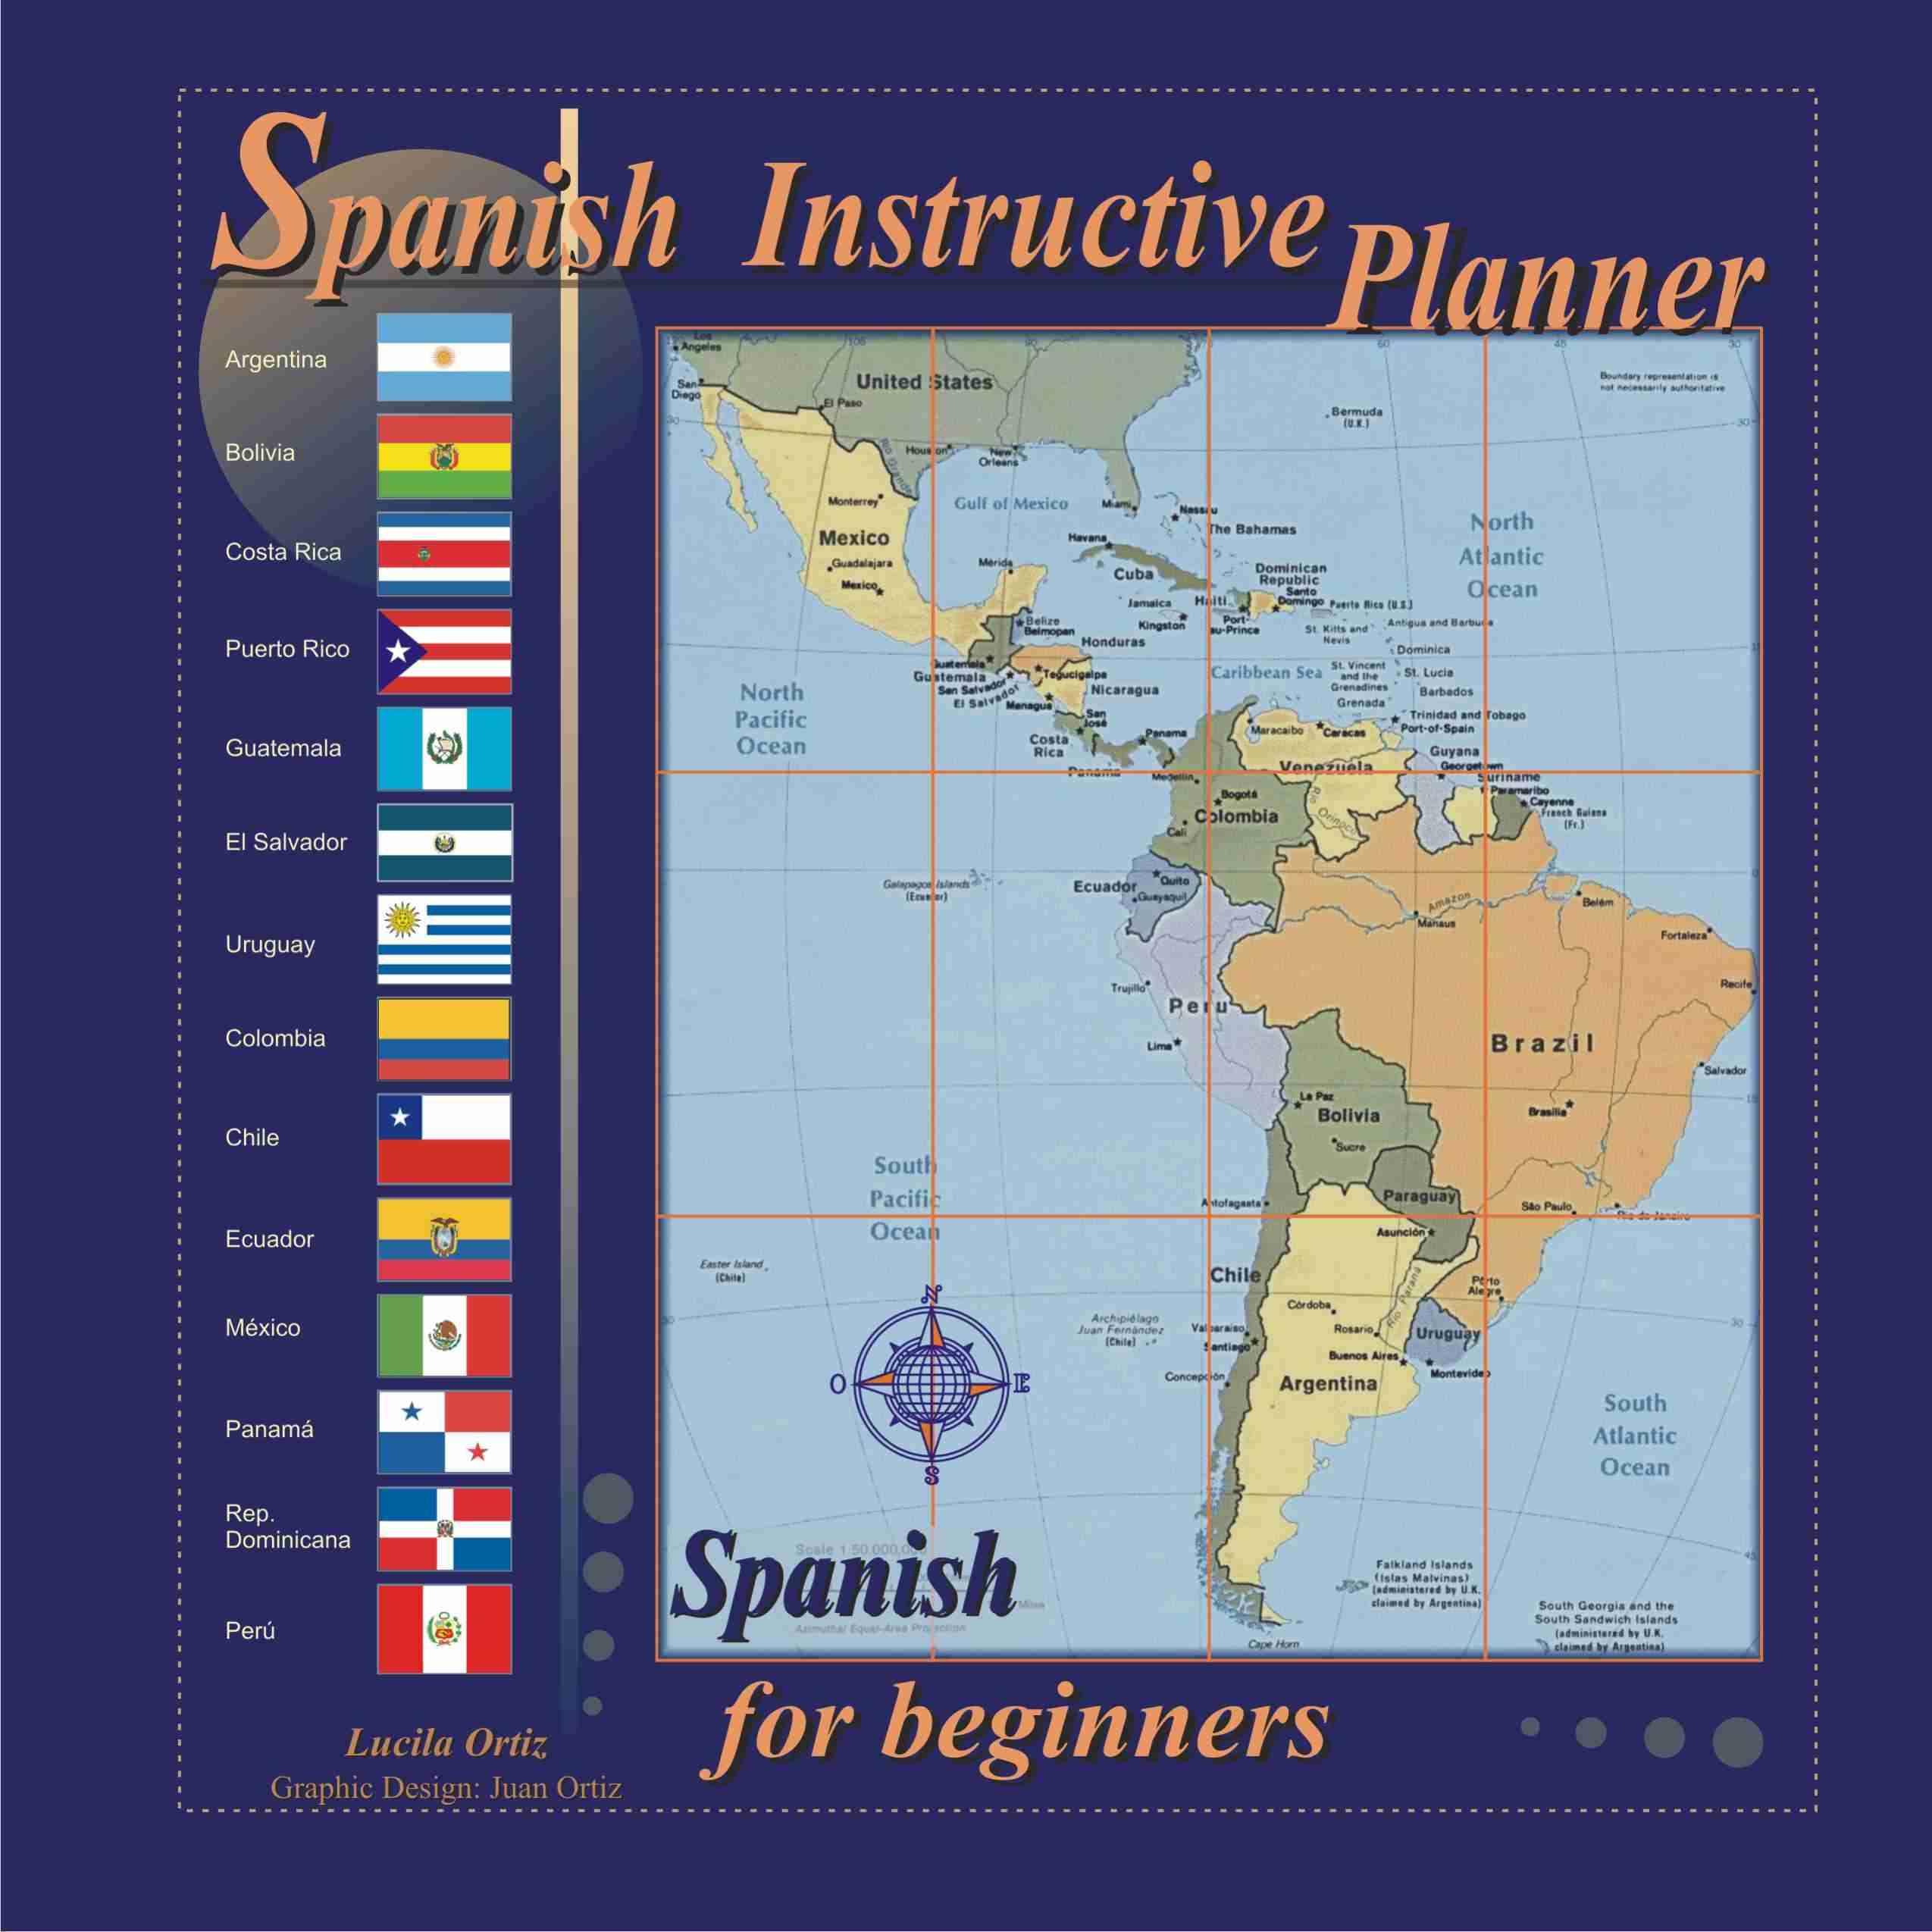 Spanish Instructive Planner